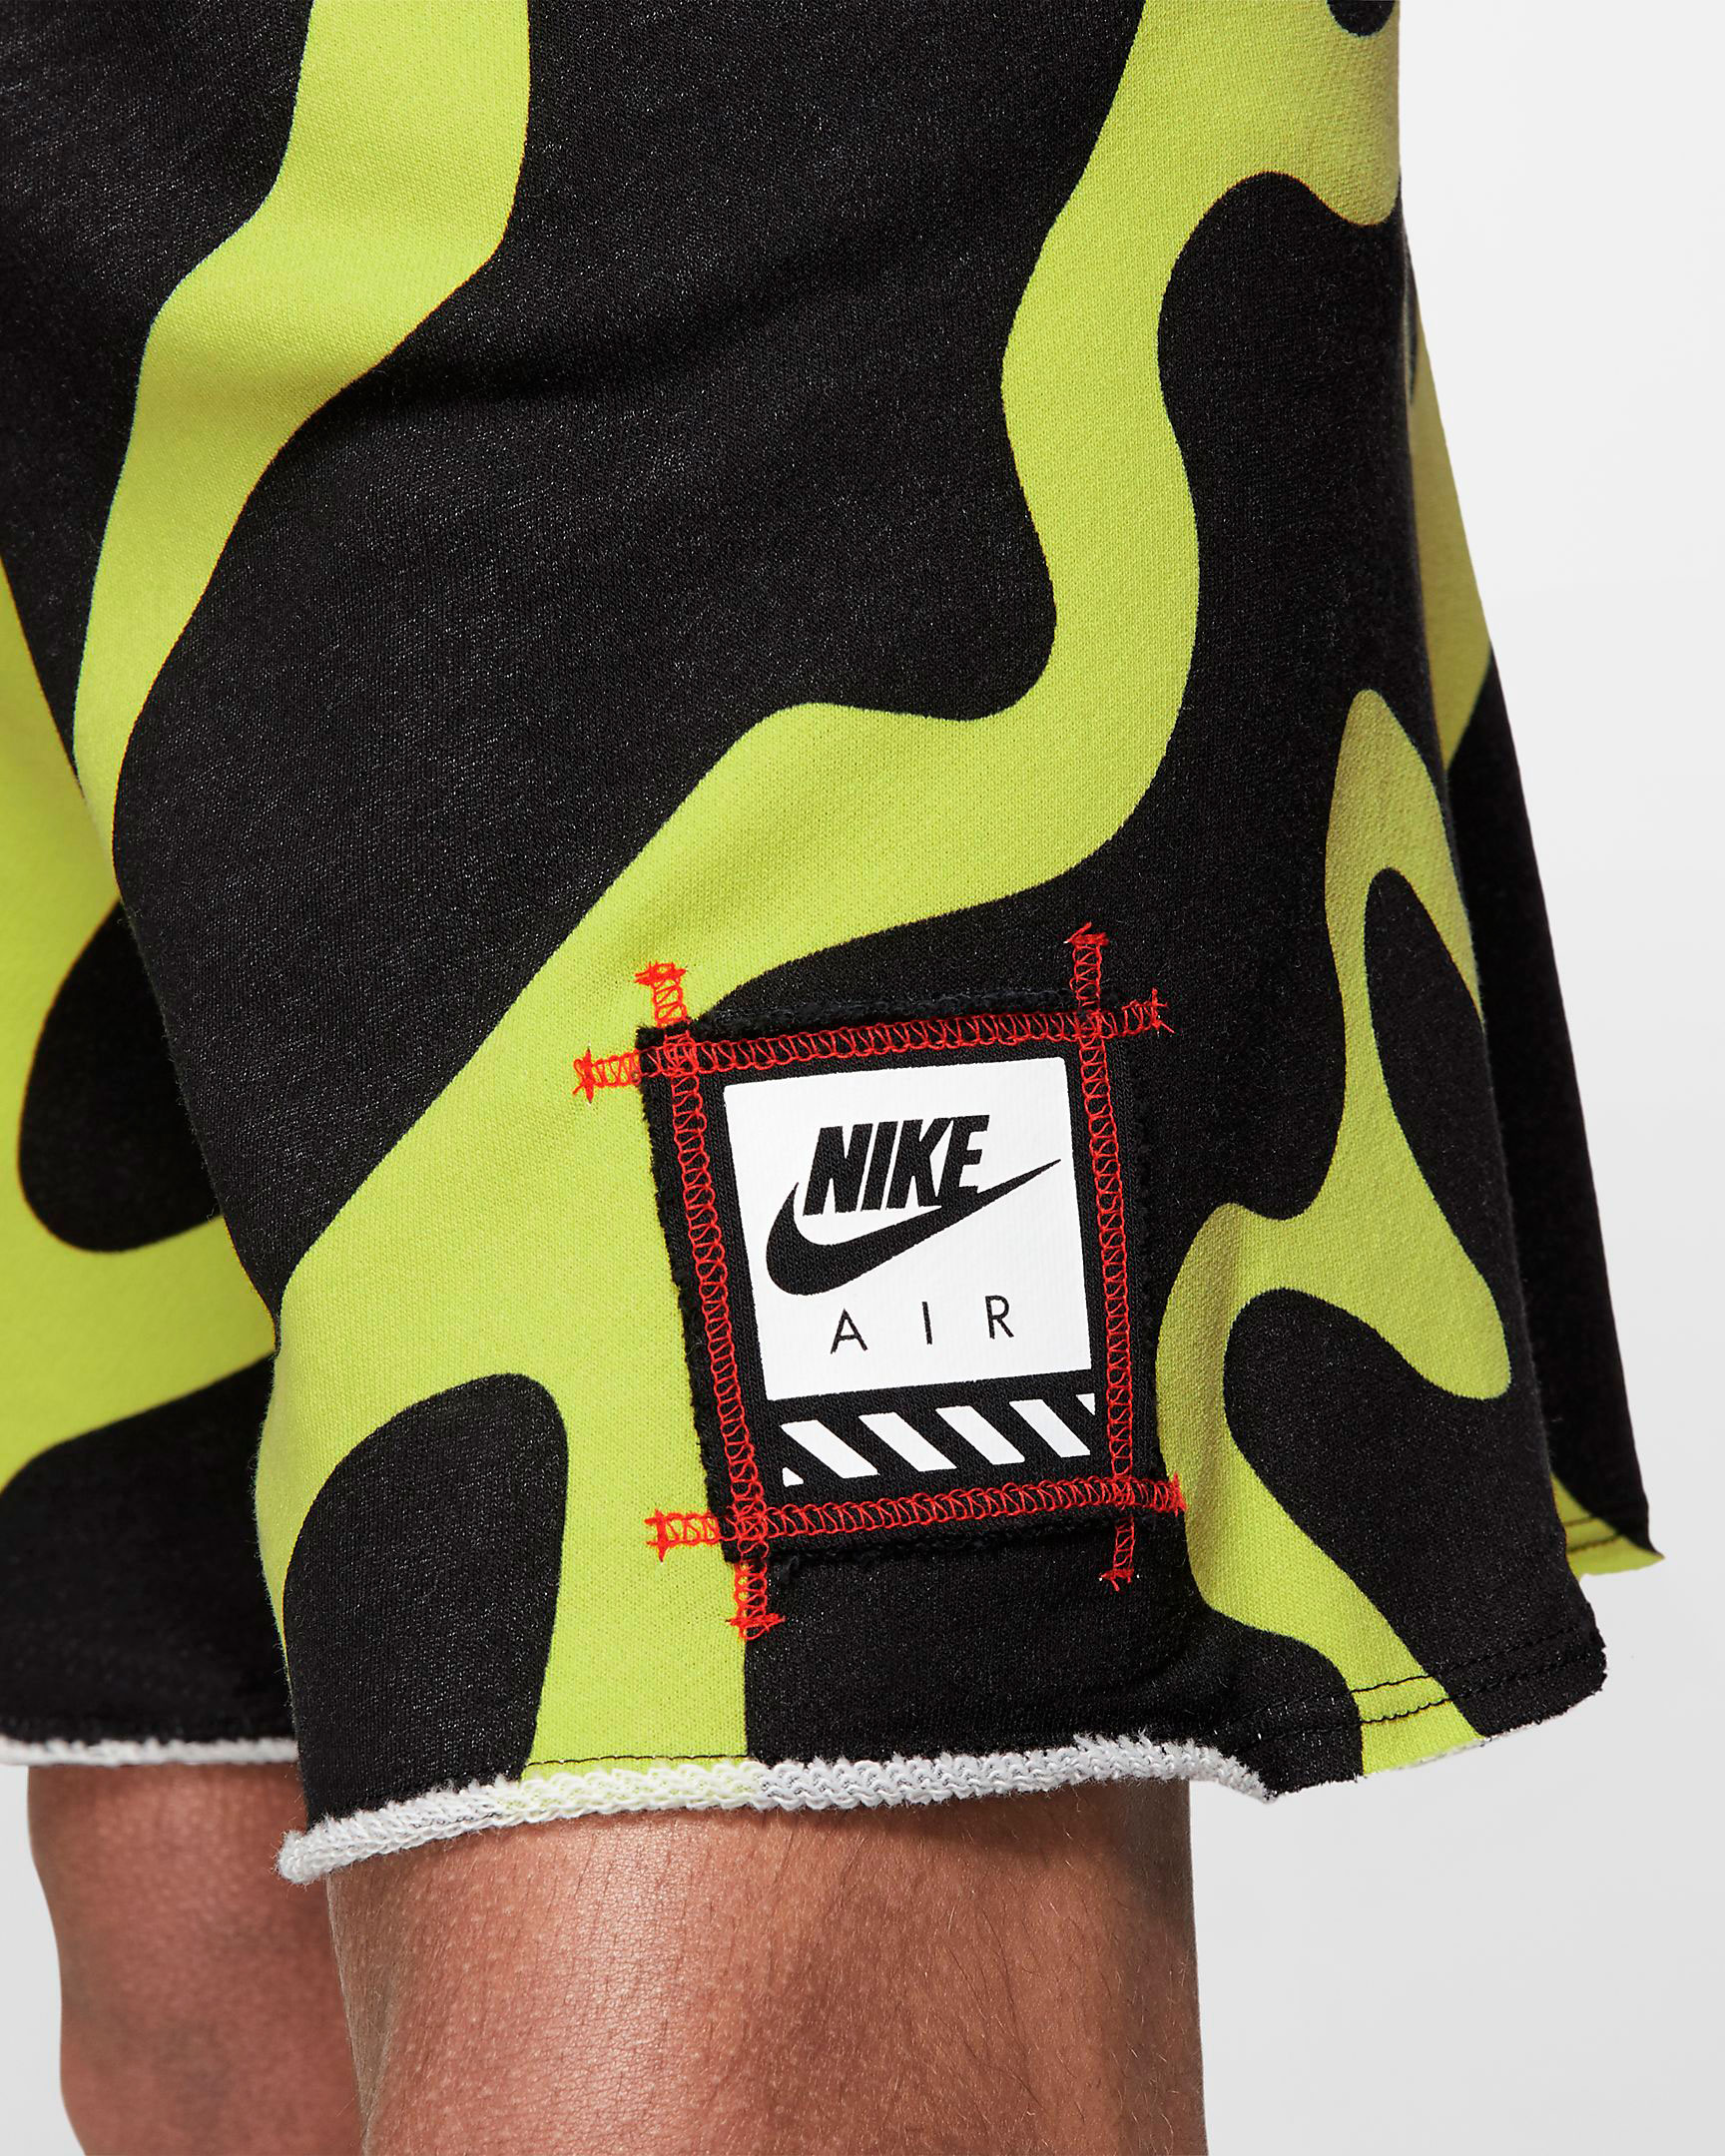 nike-air-midnight-glow-shorts-2